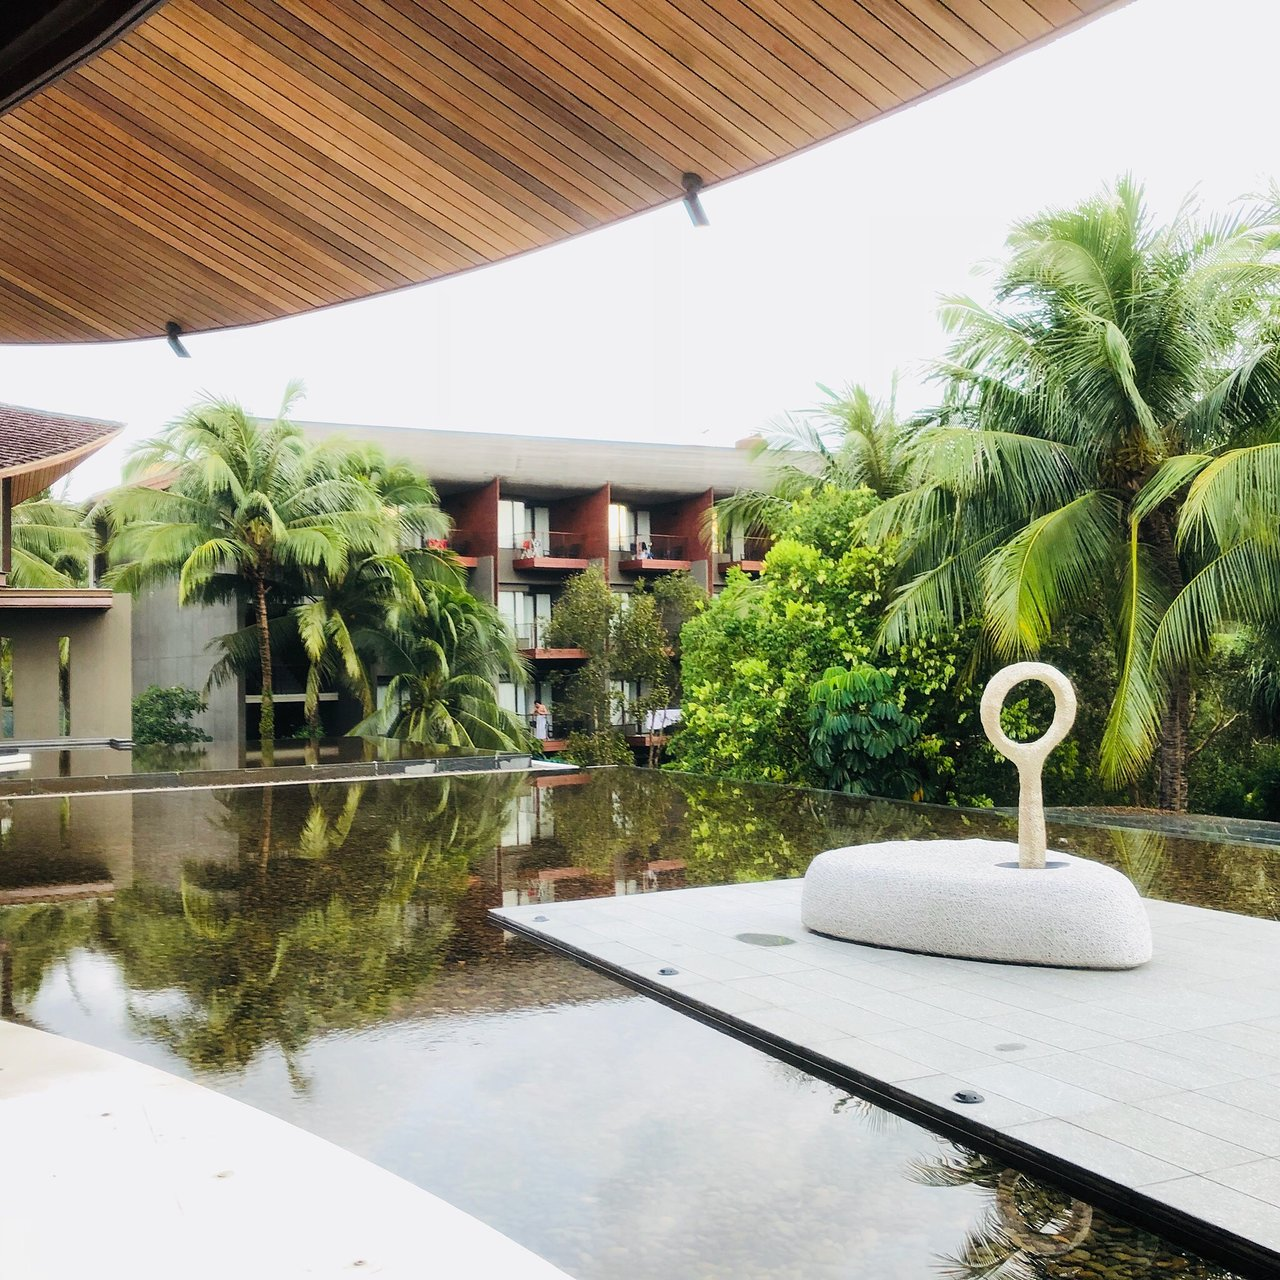 Renaissance Phuket Resort Spa 5 , Thailand, Phuket: description, reviews